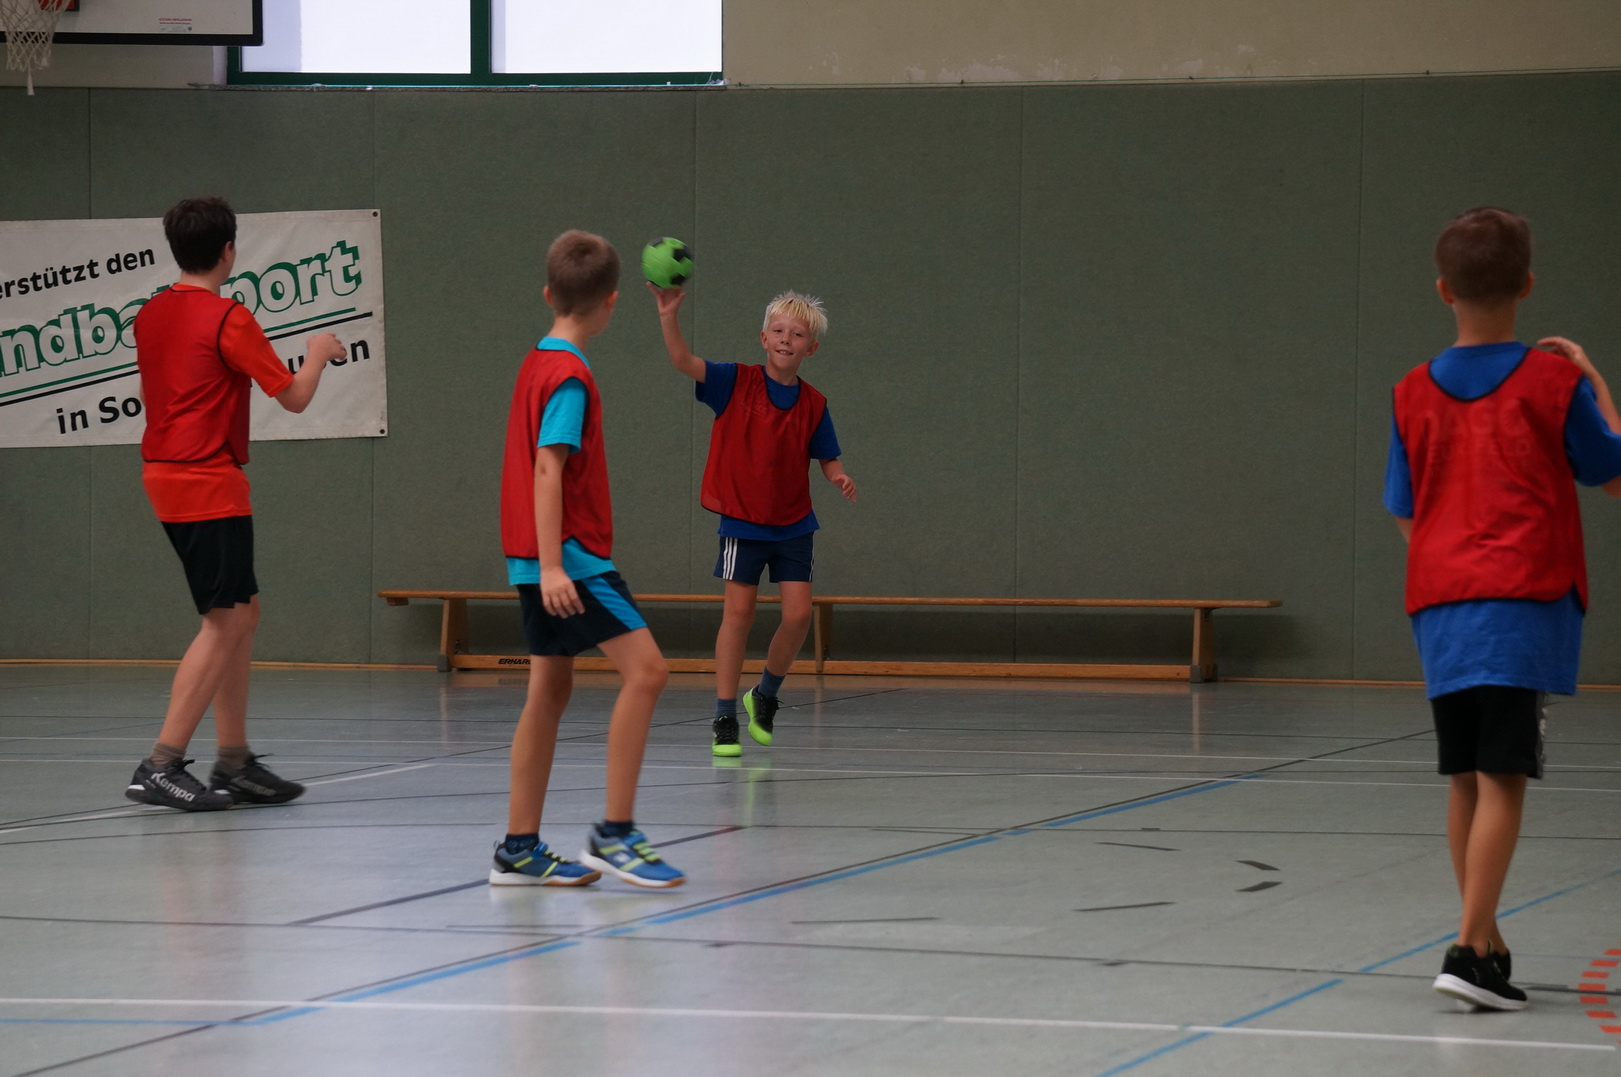 201808_Handballcamp_SDH_MG_280w